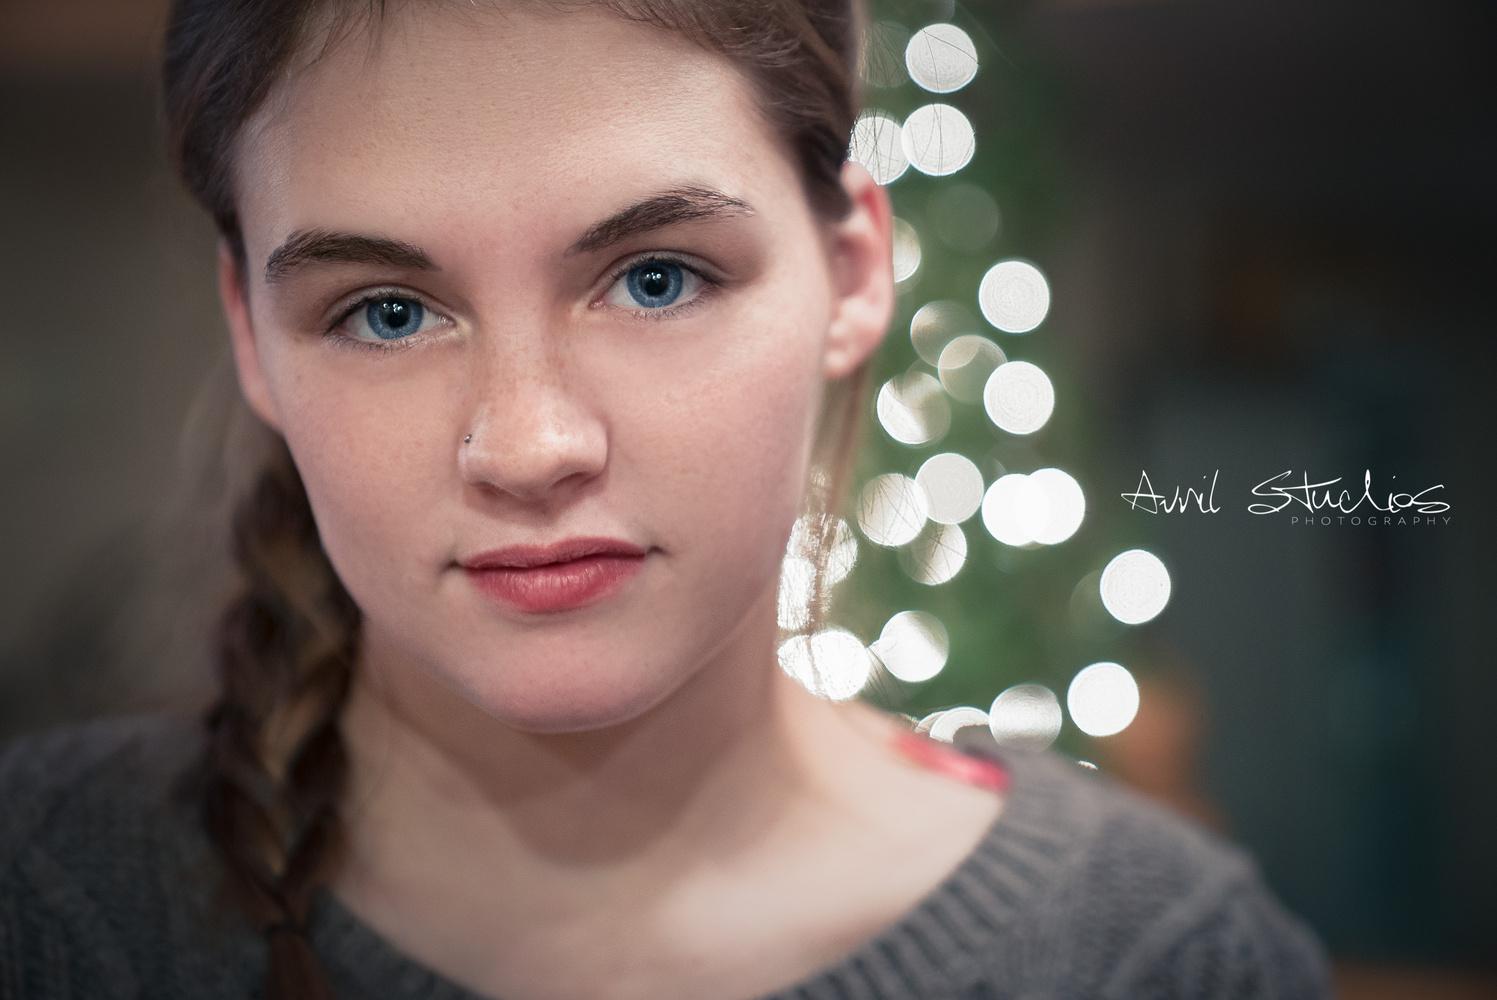 Christmas Tree Lights Portrait  by David Morales